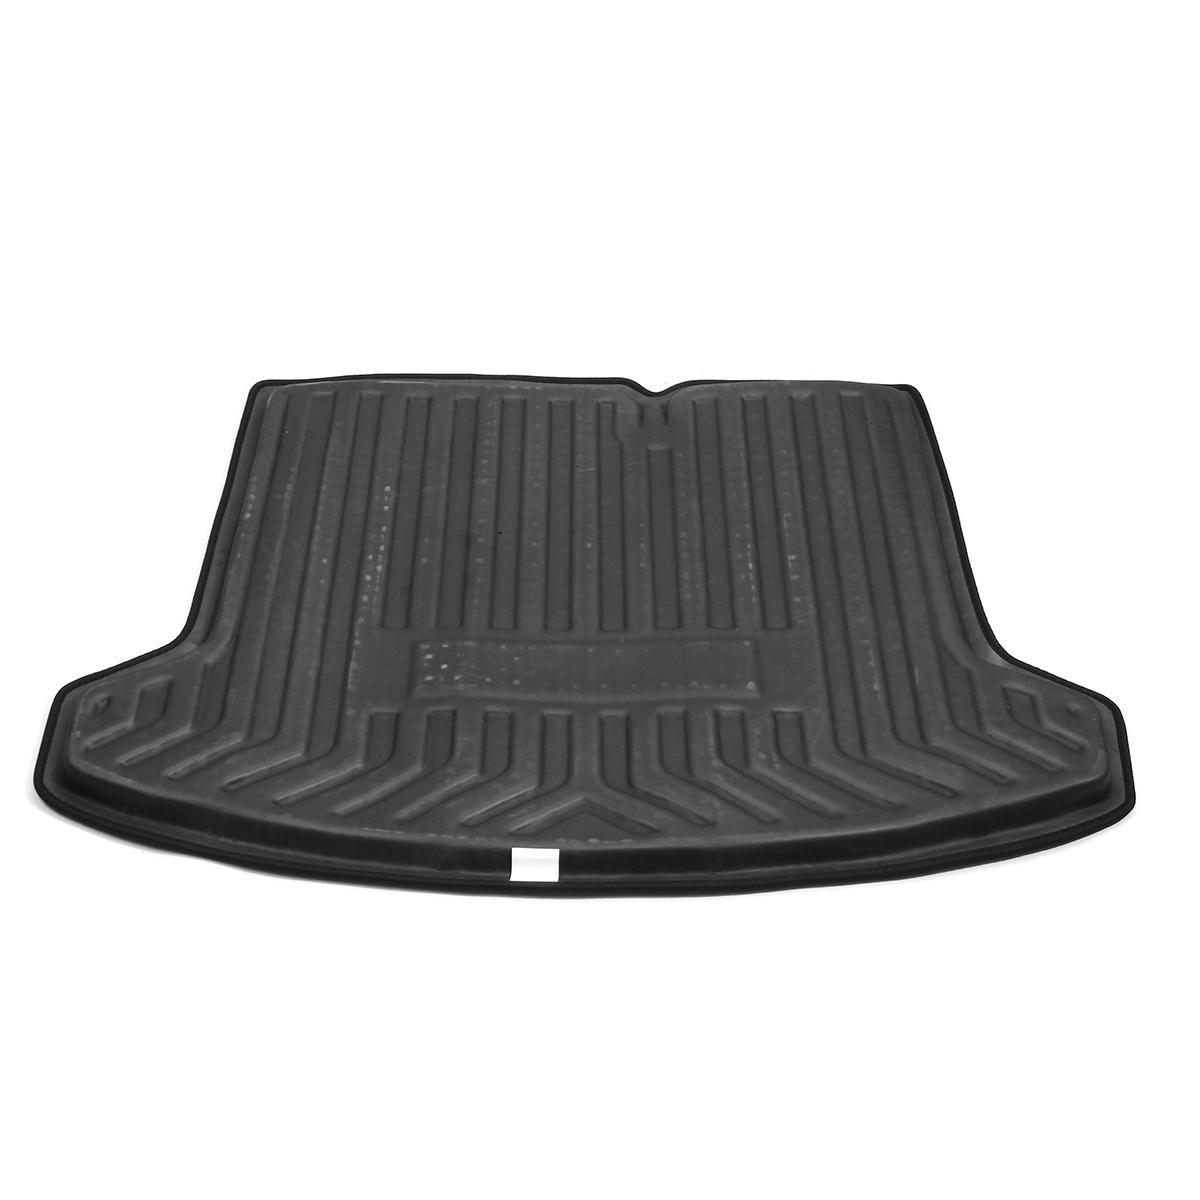 Car Rear Trunk Cargo Boot Liner Mat Tray For Nissan Kicks 2017-2018